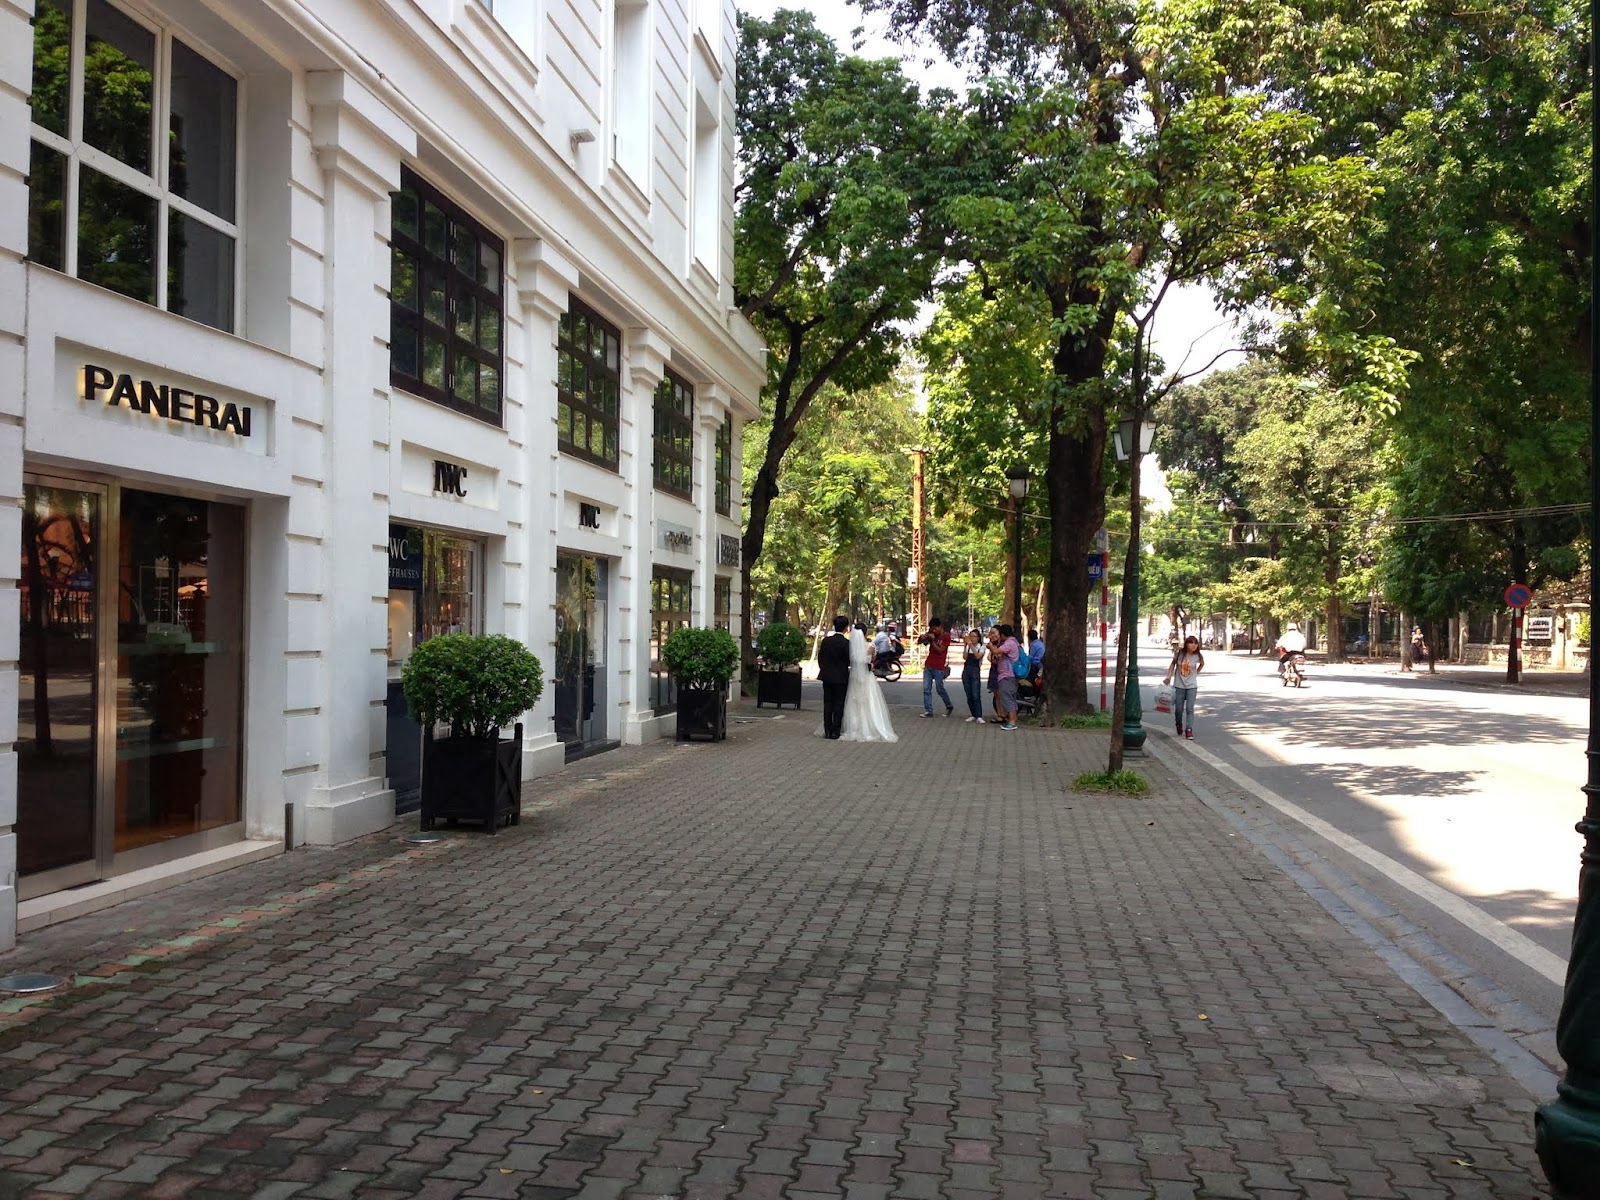 hotel-metropole-hanoi ソフィテルメトロポールホテル2